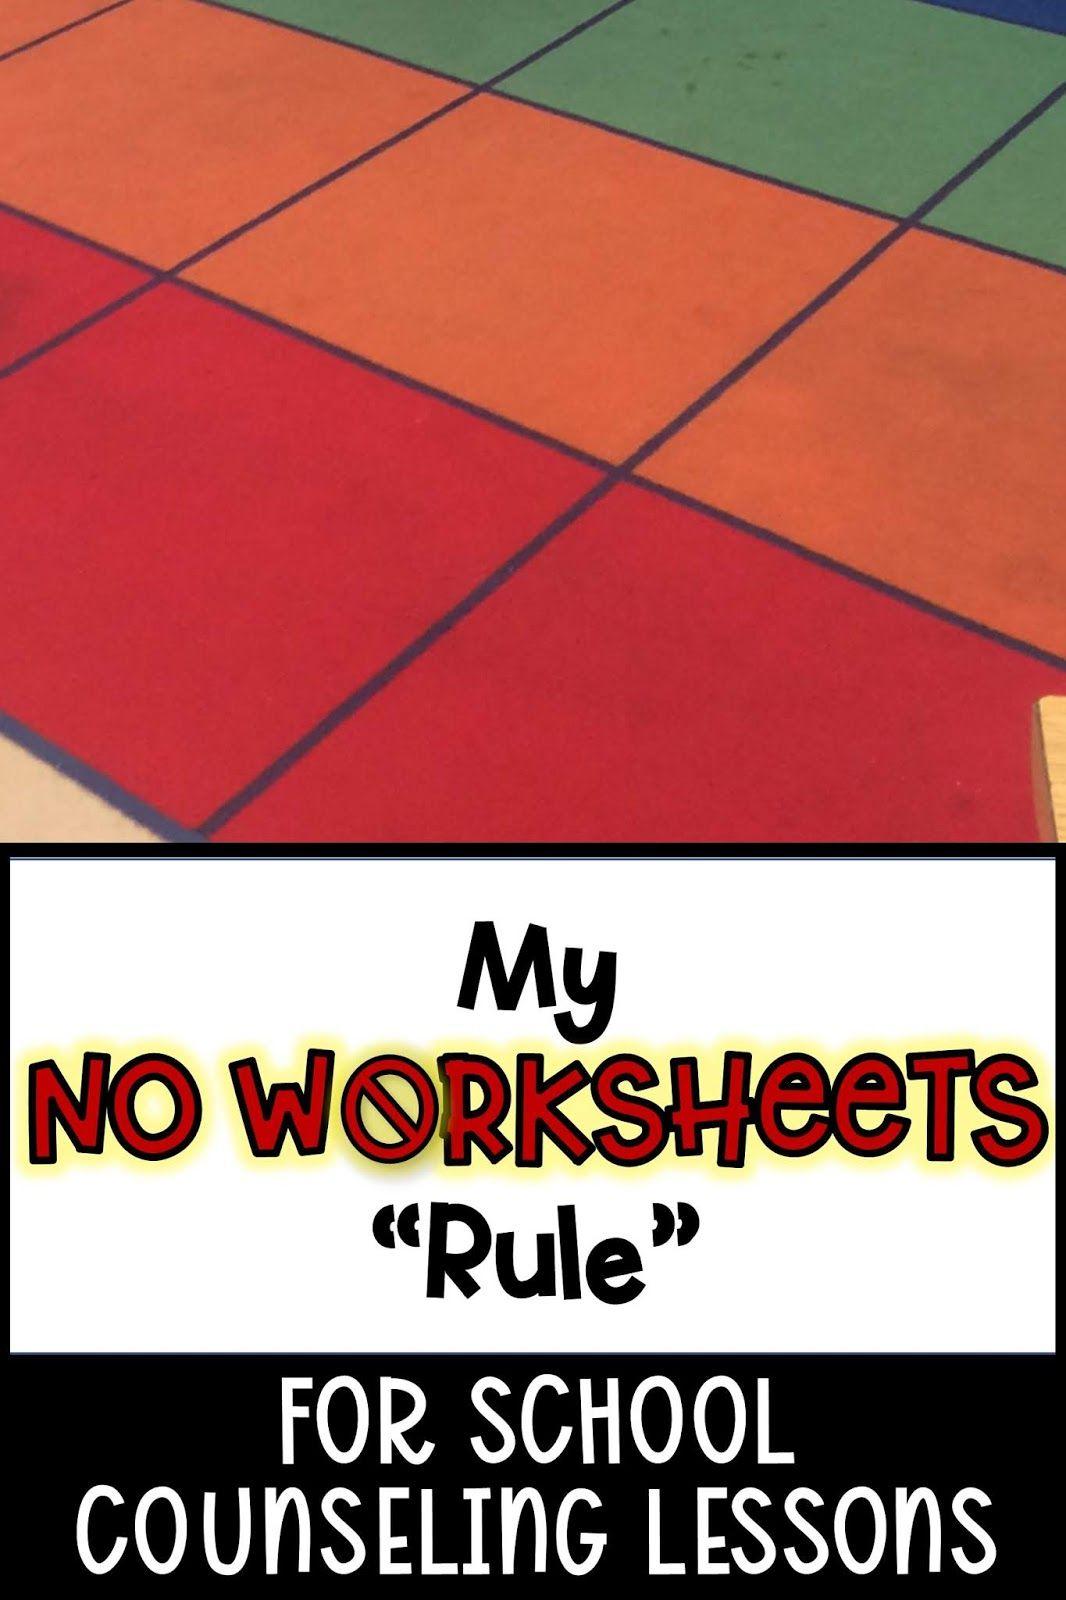 My No Worksheets Rule